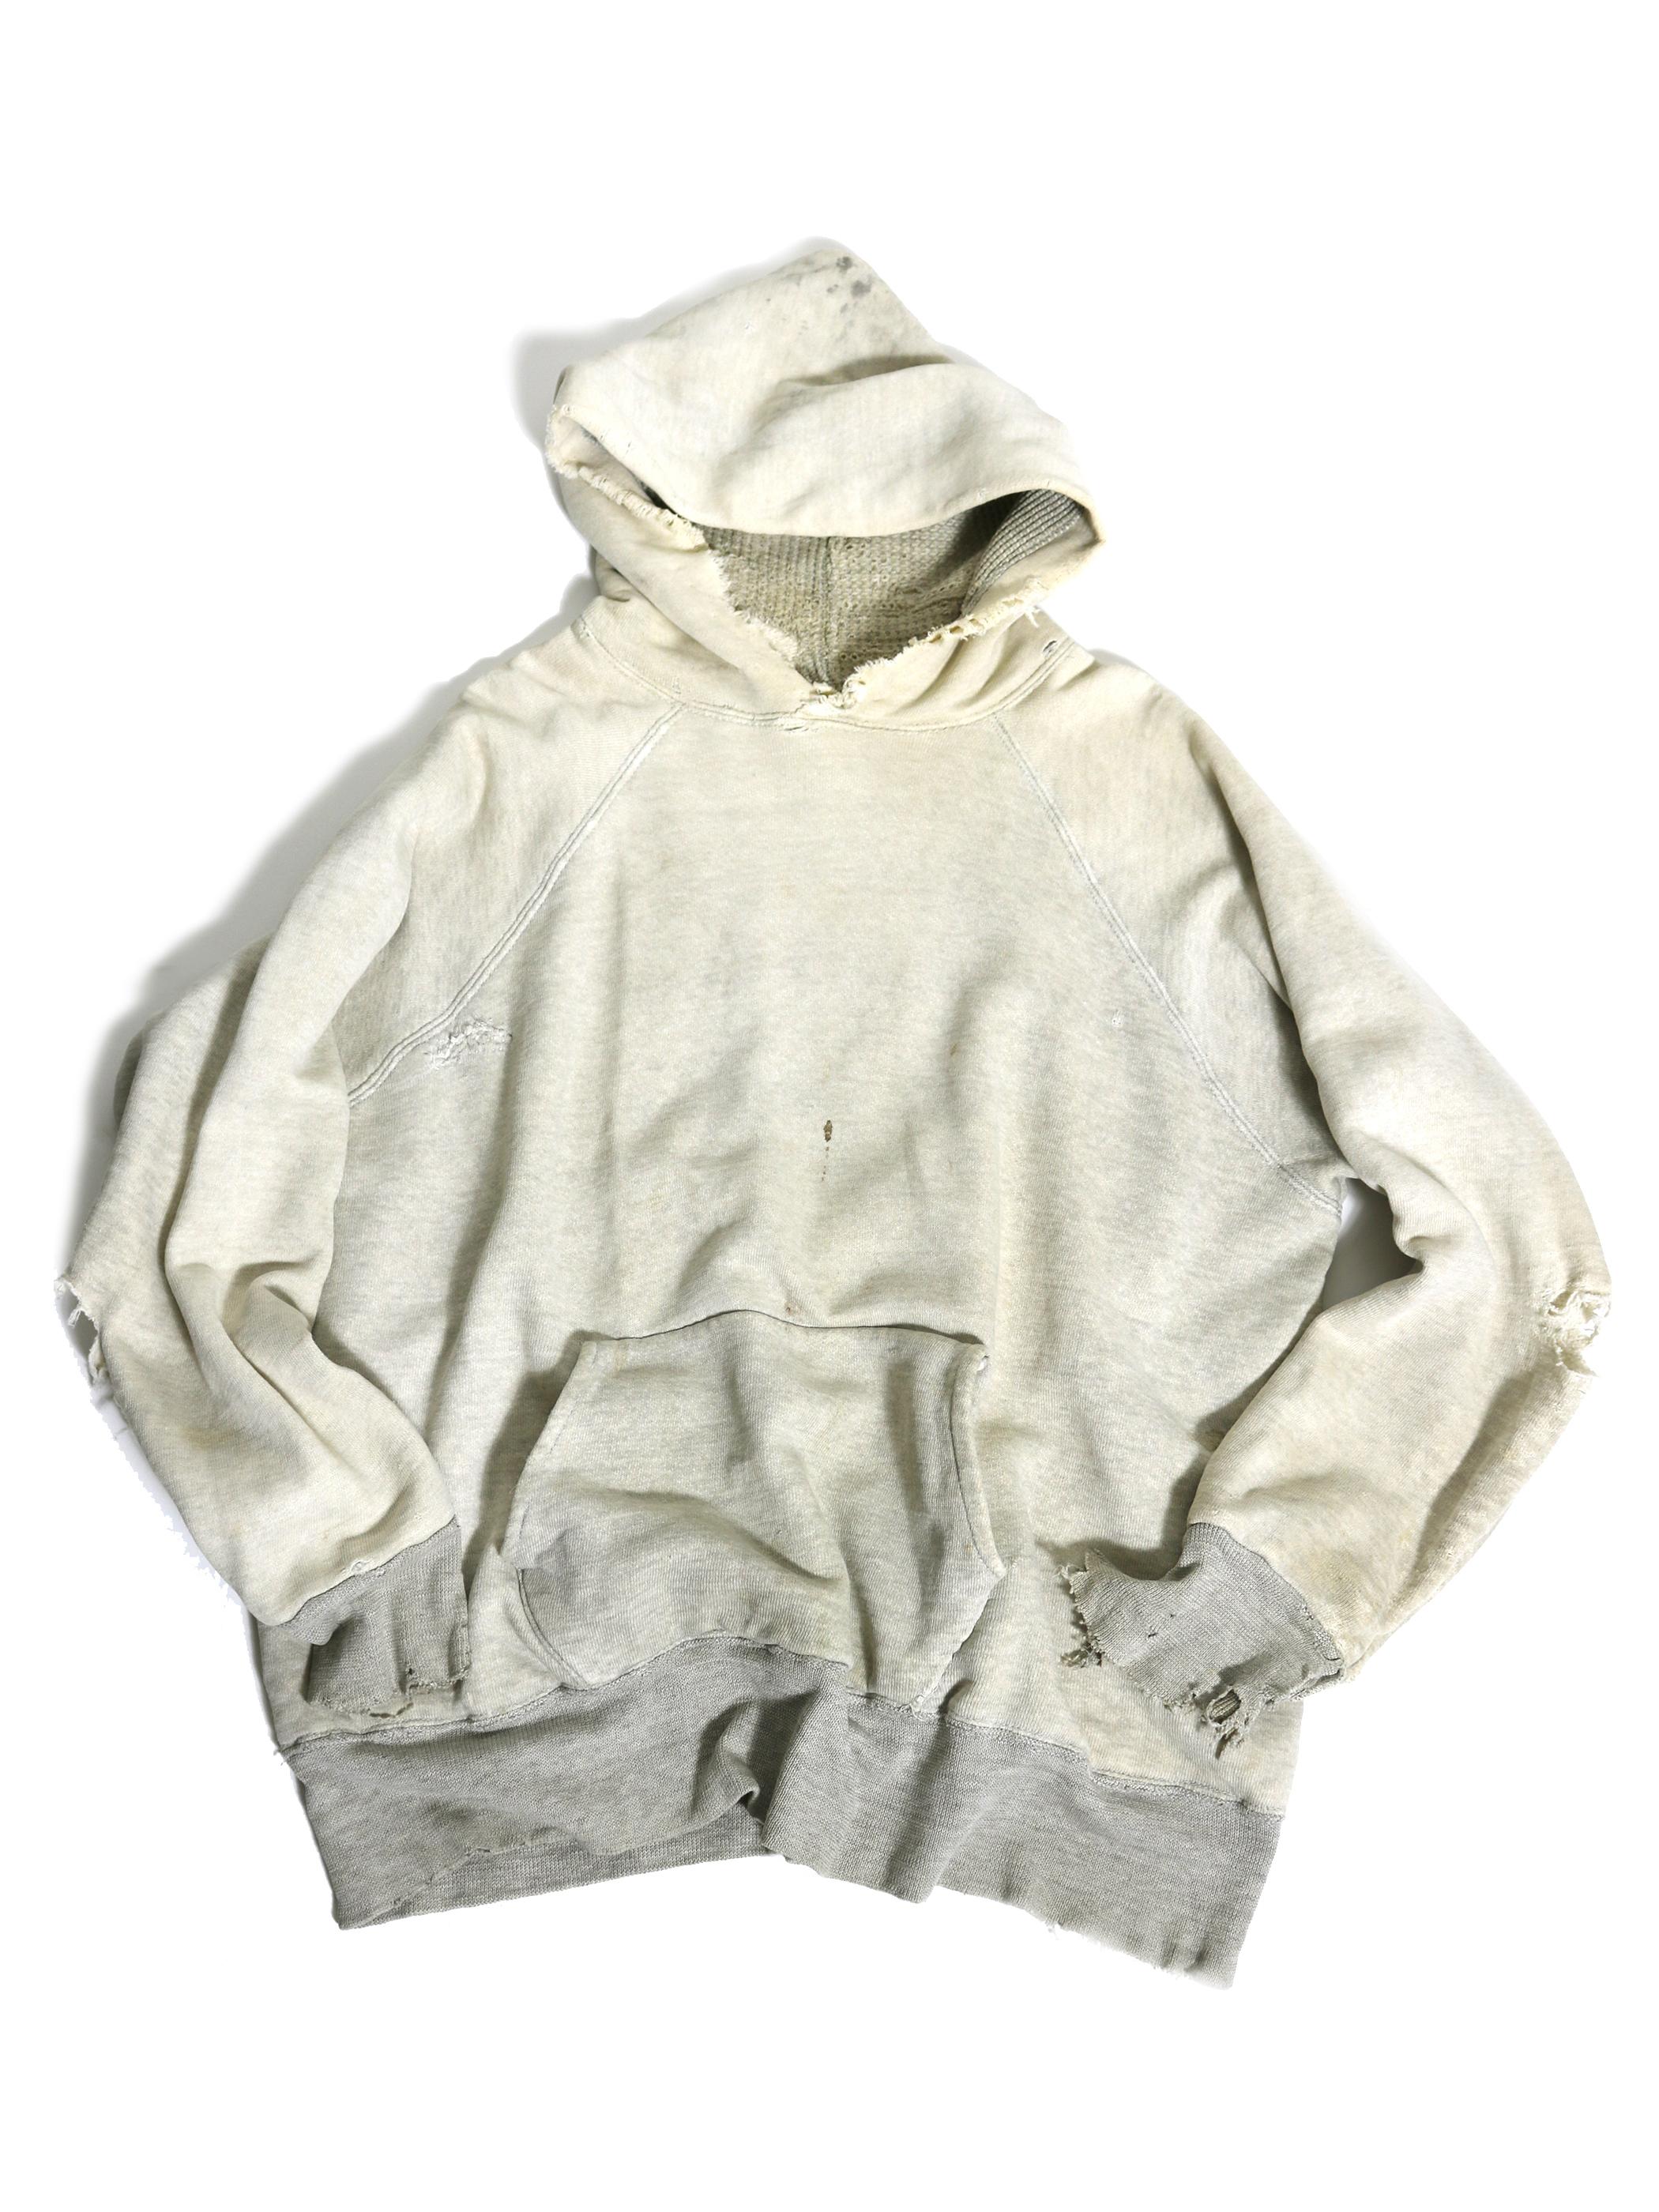 1950-60's Sweat Hoodie